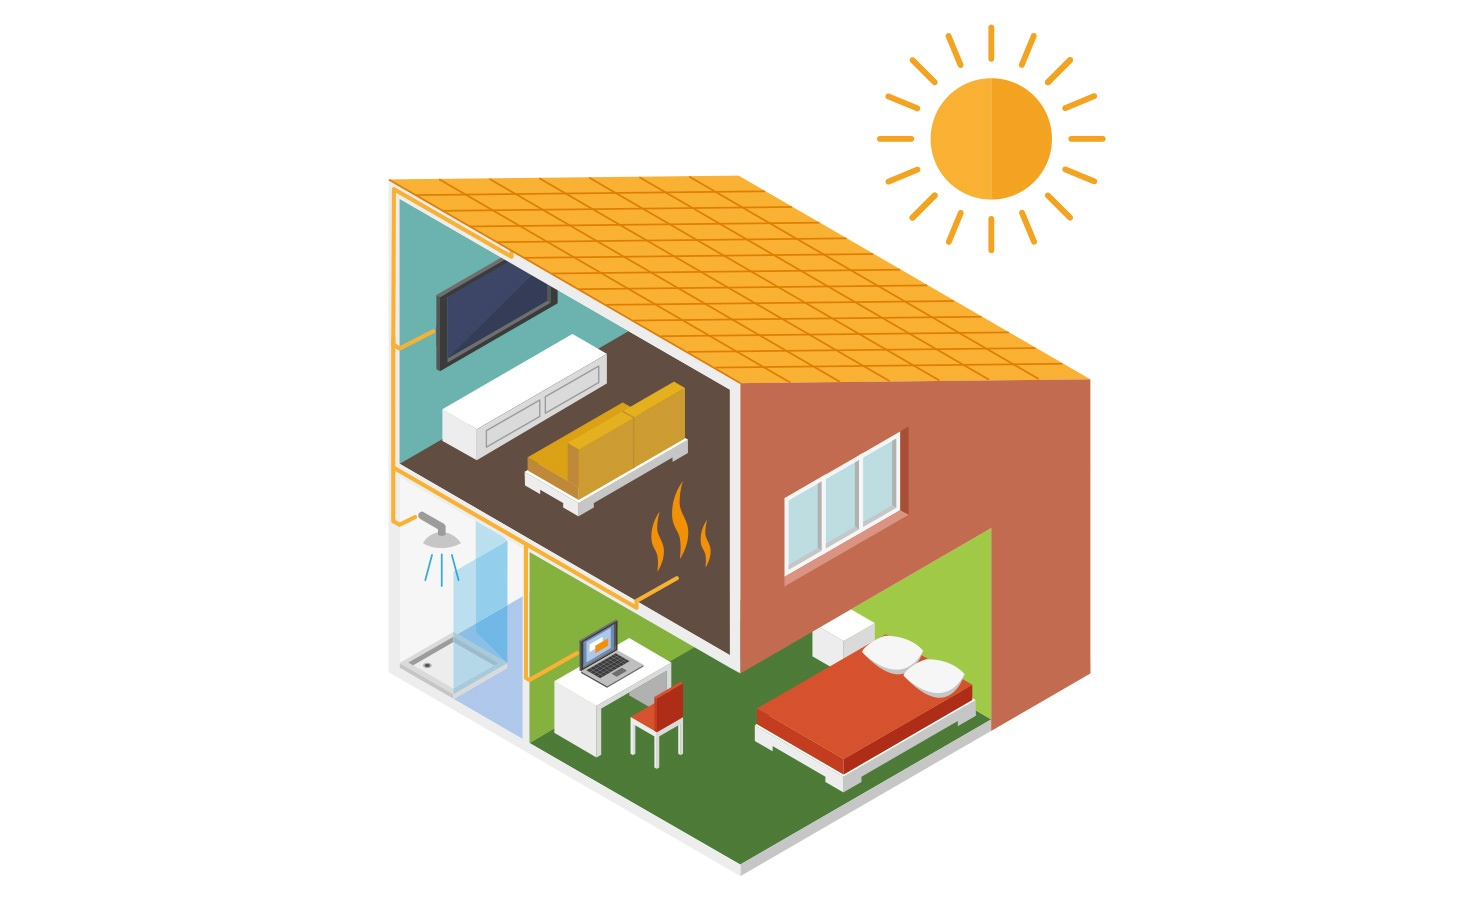 Future Living boliger får energi fra solen